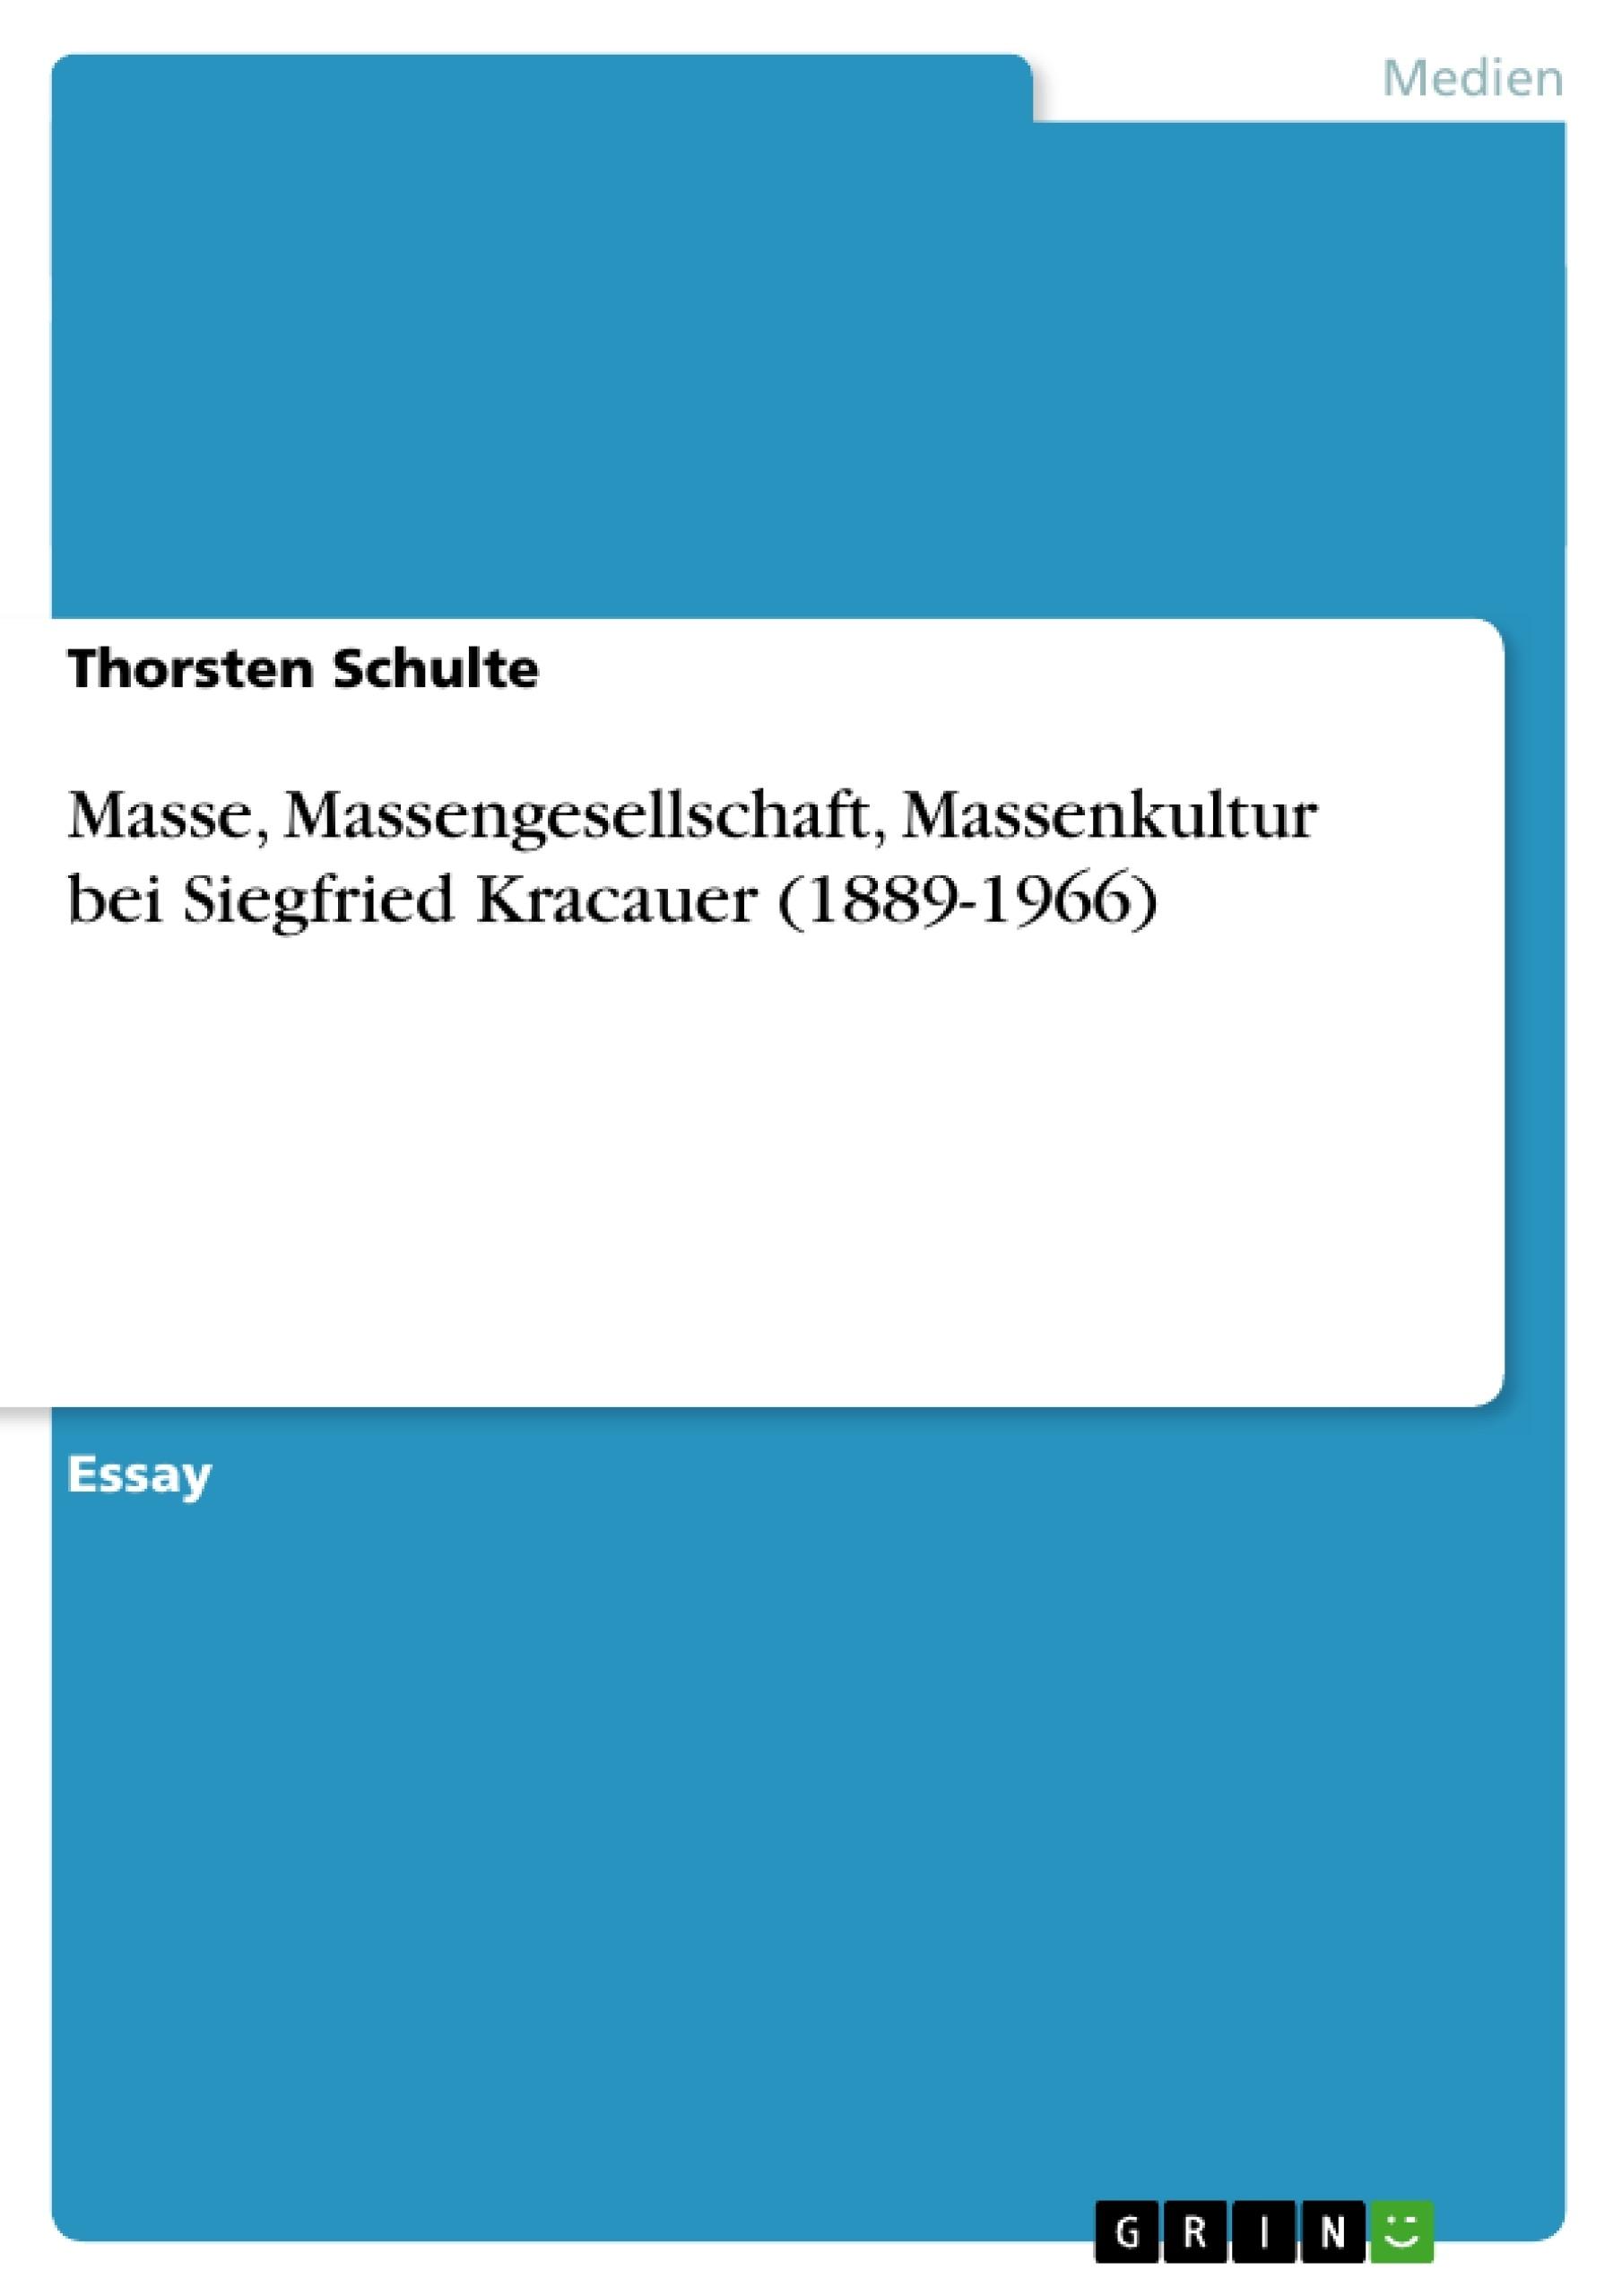 Titel: Masse, Massengesellschaft, Massenkultur bei Siegfried Kracauer (1889-1966)